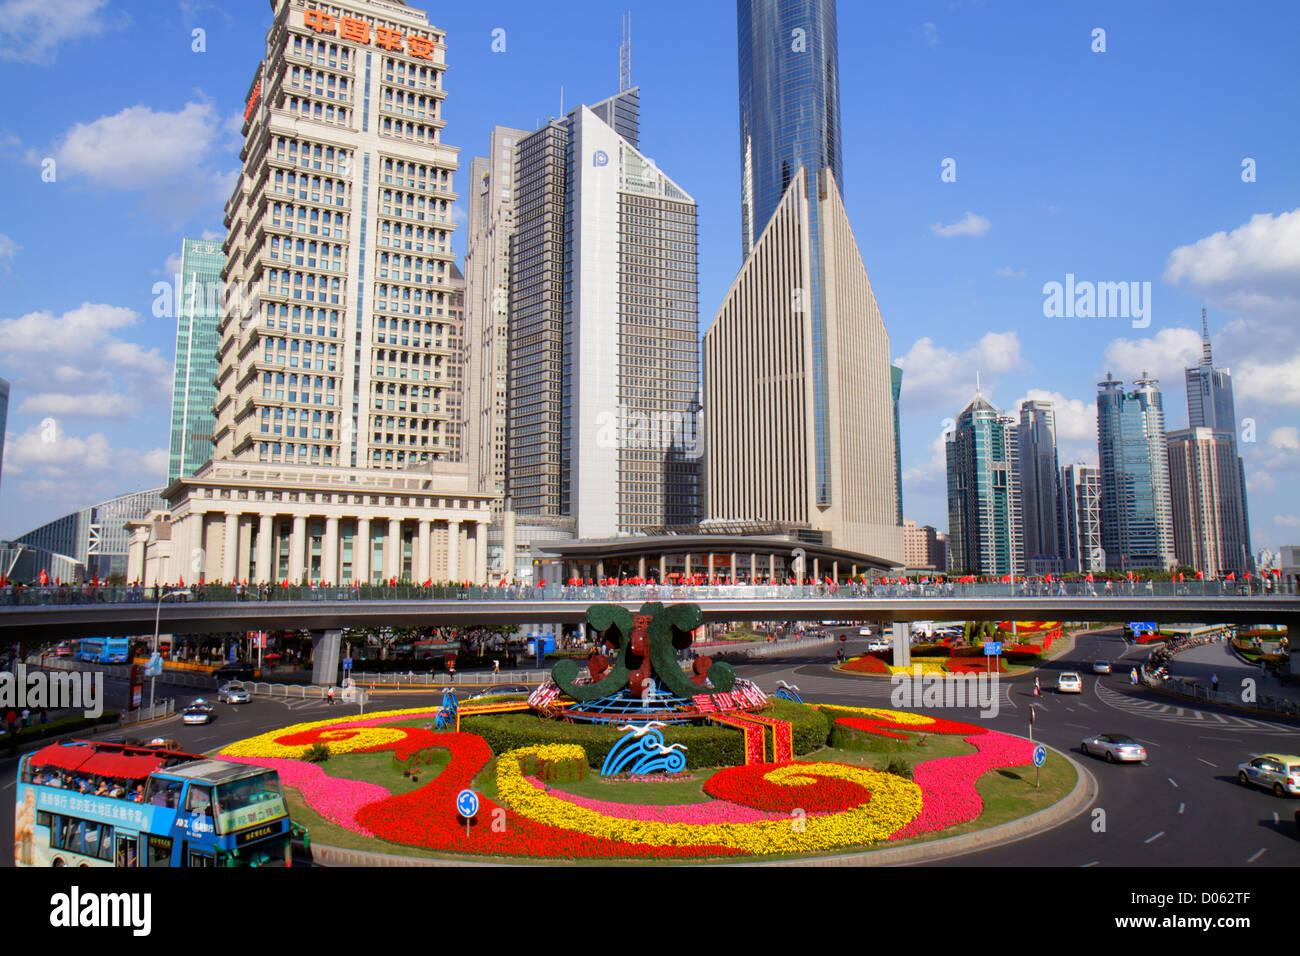 Chine Shanghai Lujiazui Pudong Lujiazui Financial District Pont piétonnier vue depuis le rond Chine Ping'an Photo Stock